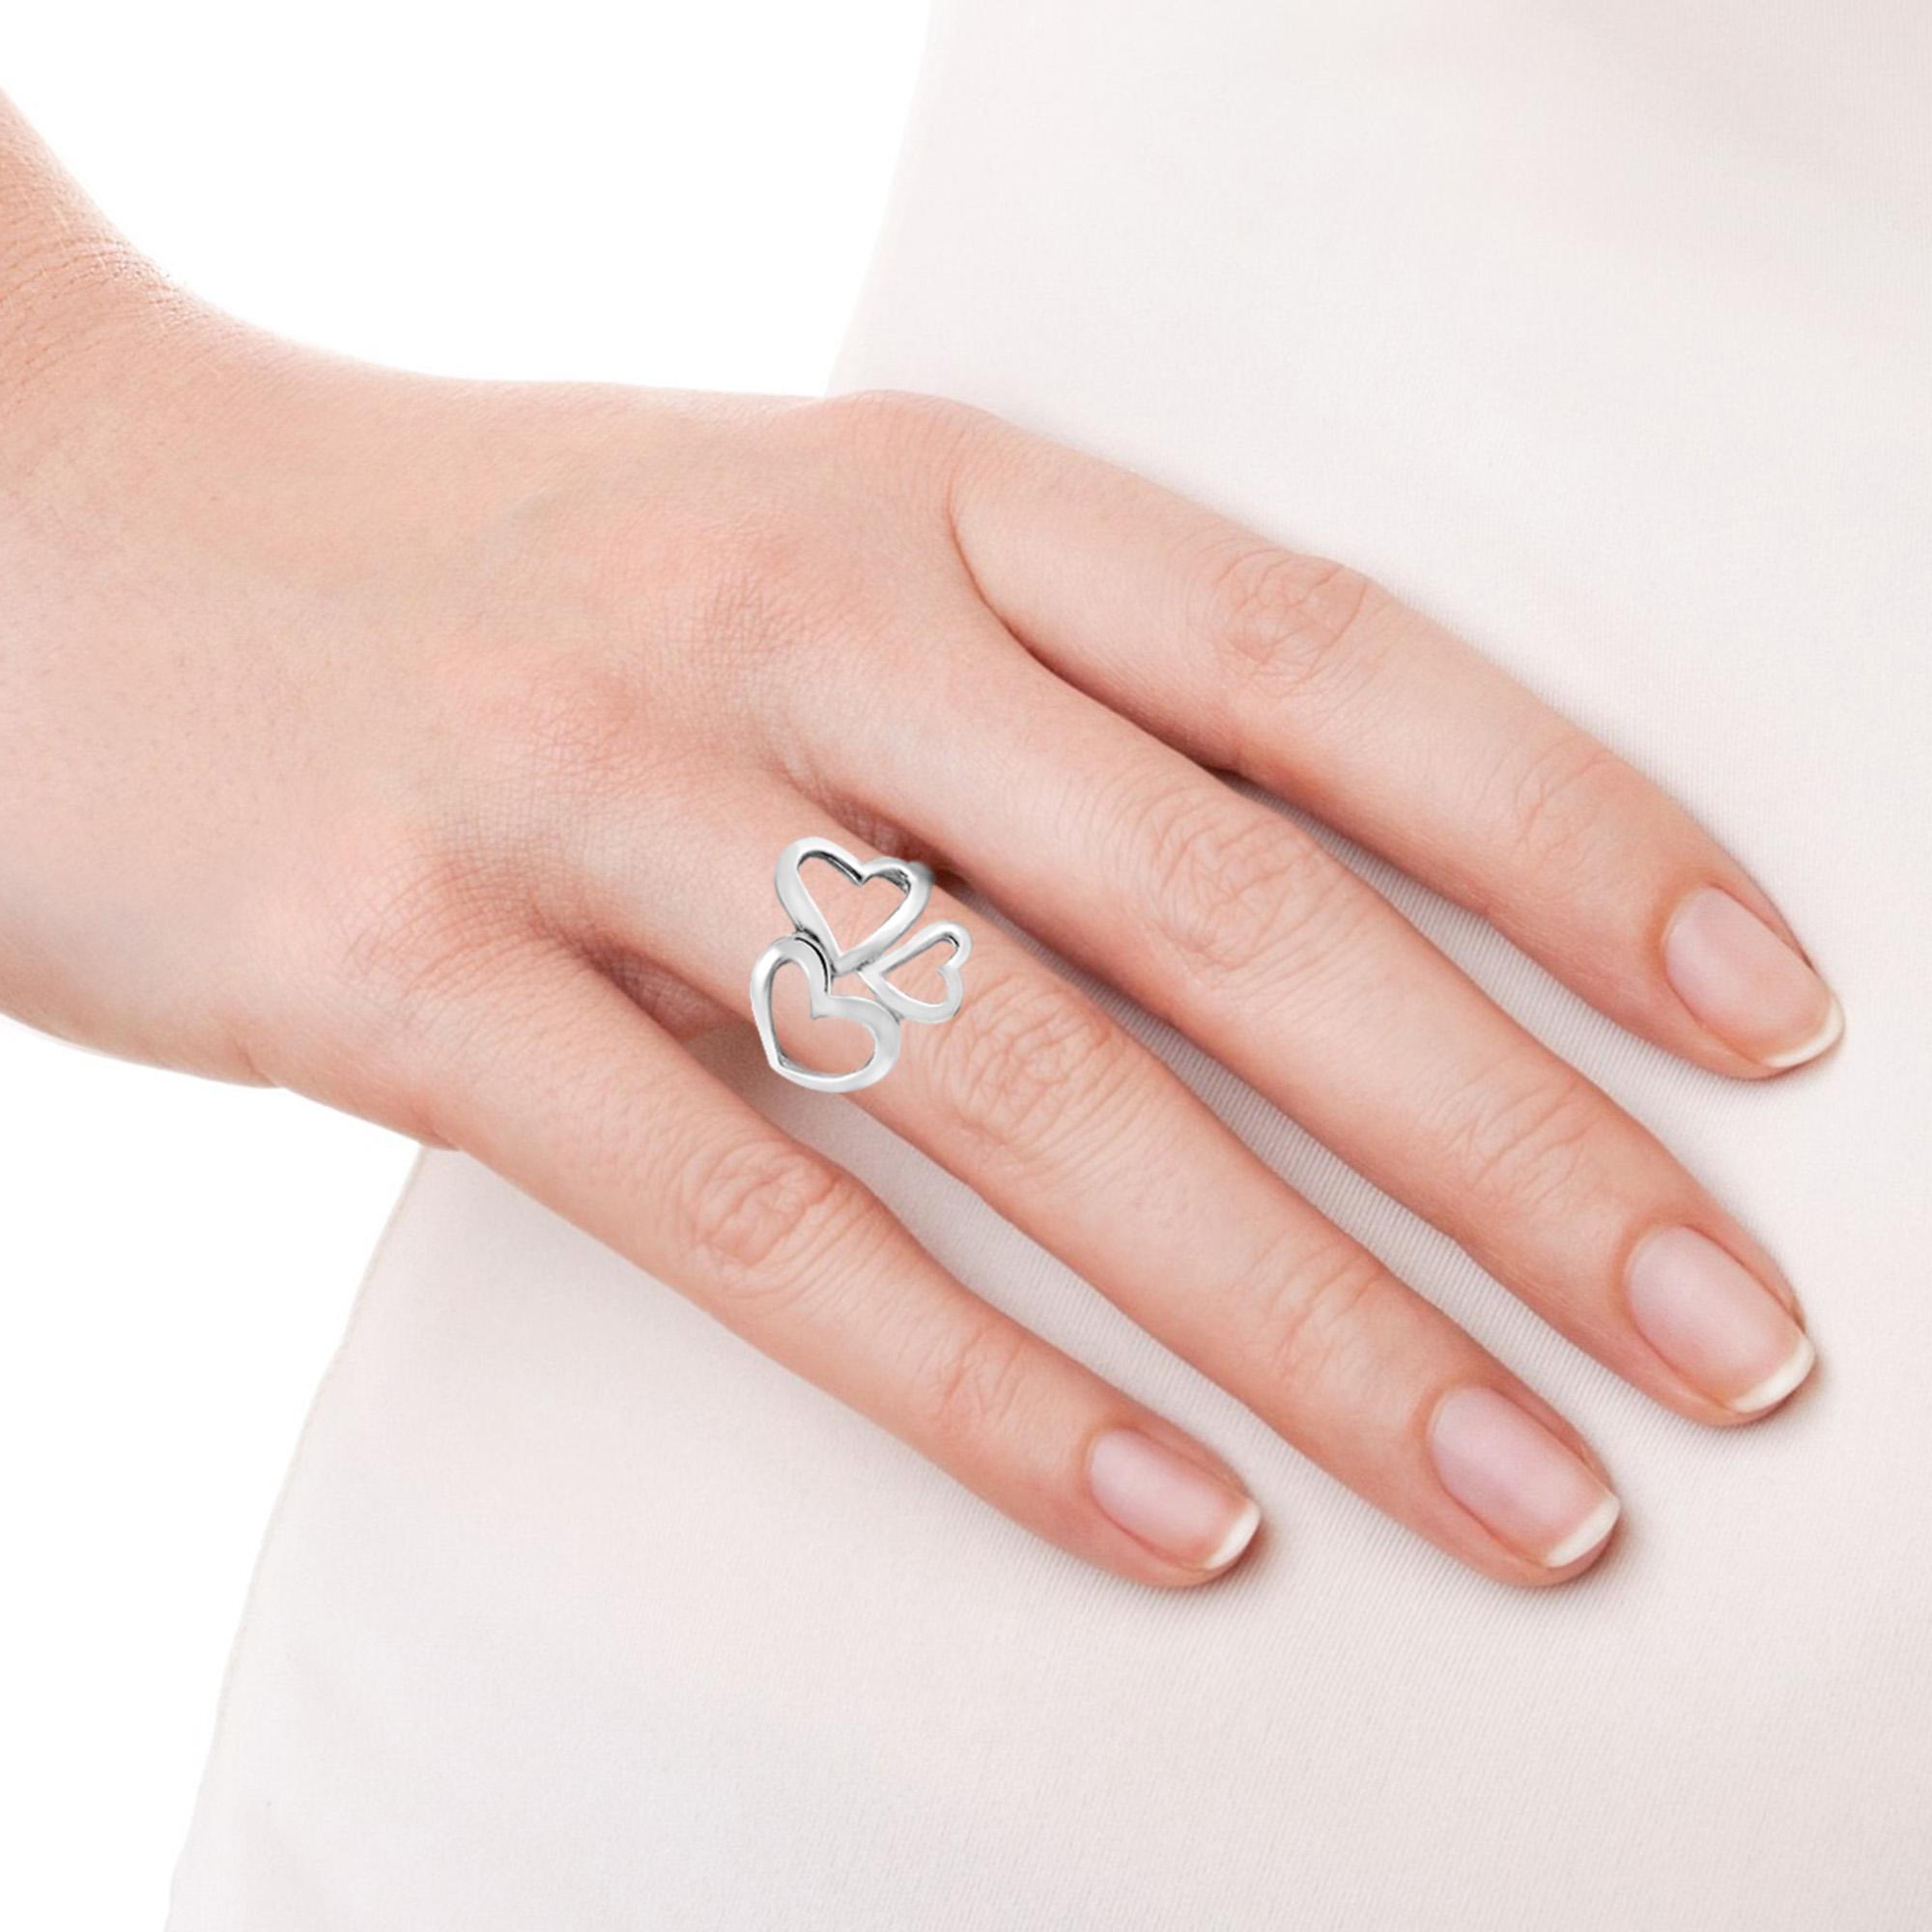 Cute Modern Triple Hearts of Love Sterling Silver Ring 6 - AeraVida